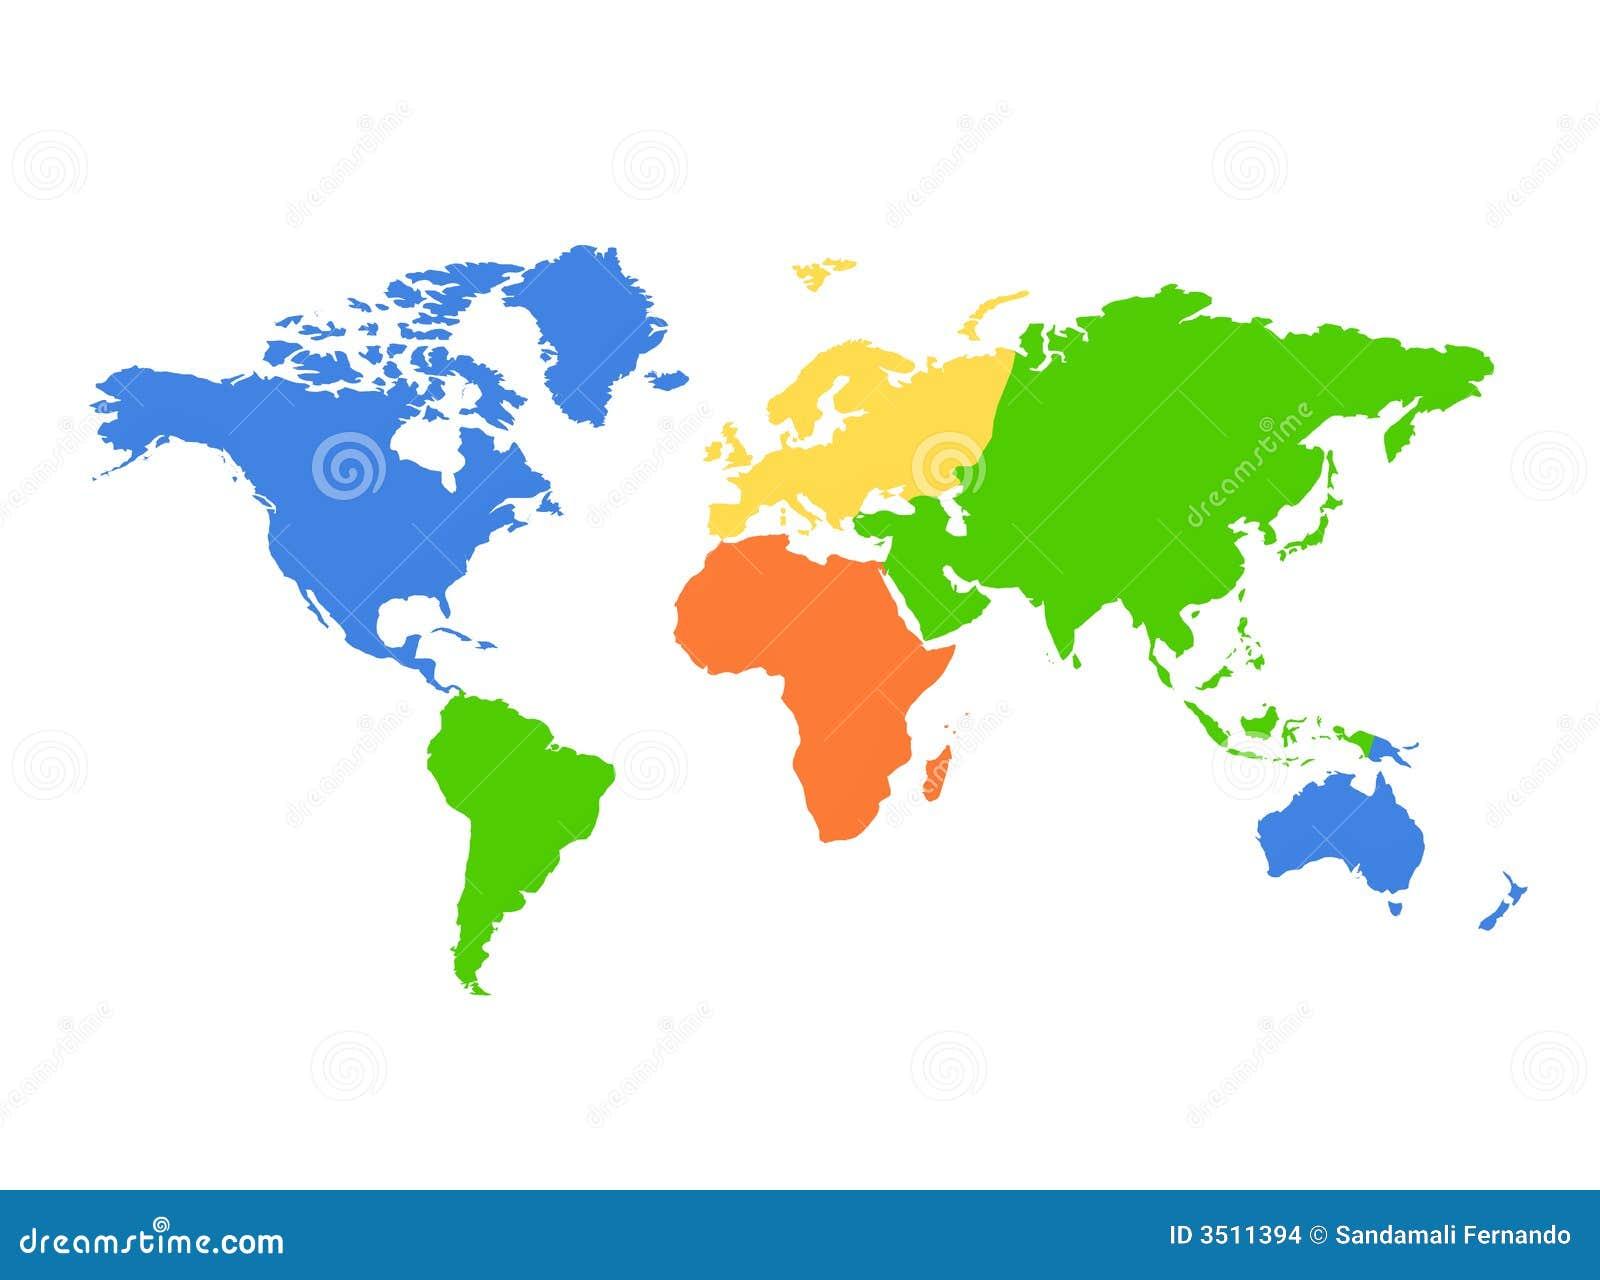 Mapa De Mundo Dos Continentes Colorido Imagens De Stock